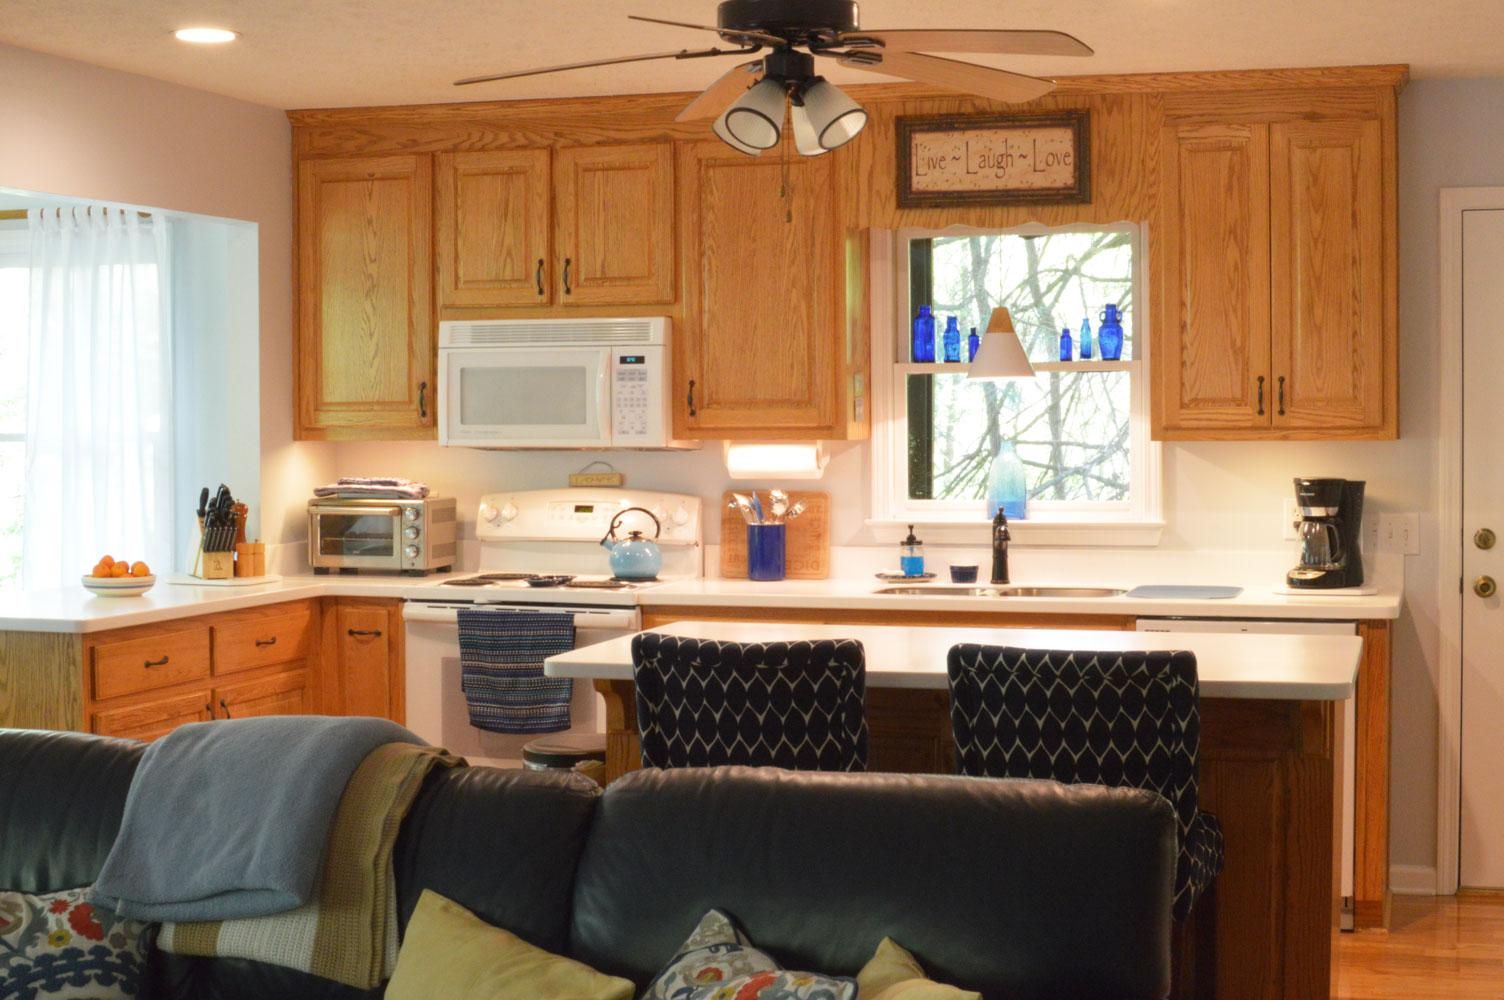 Oak-wood-cabinets-white-countertop-blue-walls-oiled-bronze-fixtures-hardware-kitchen-oak-floors-2